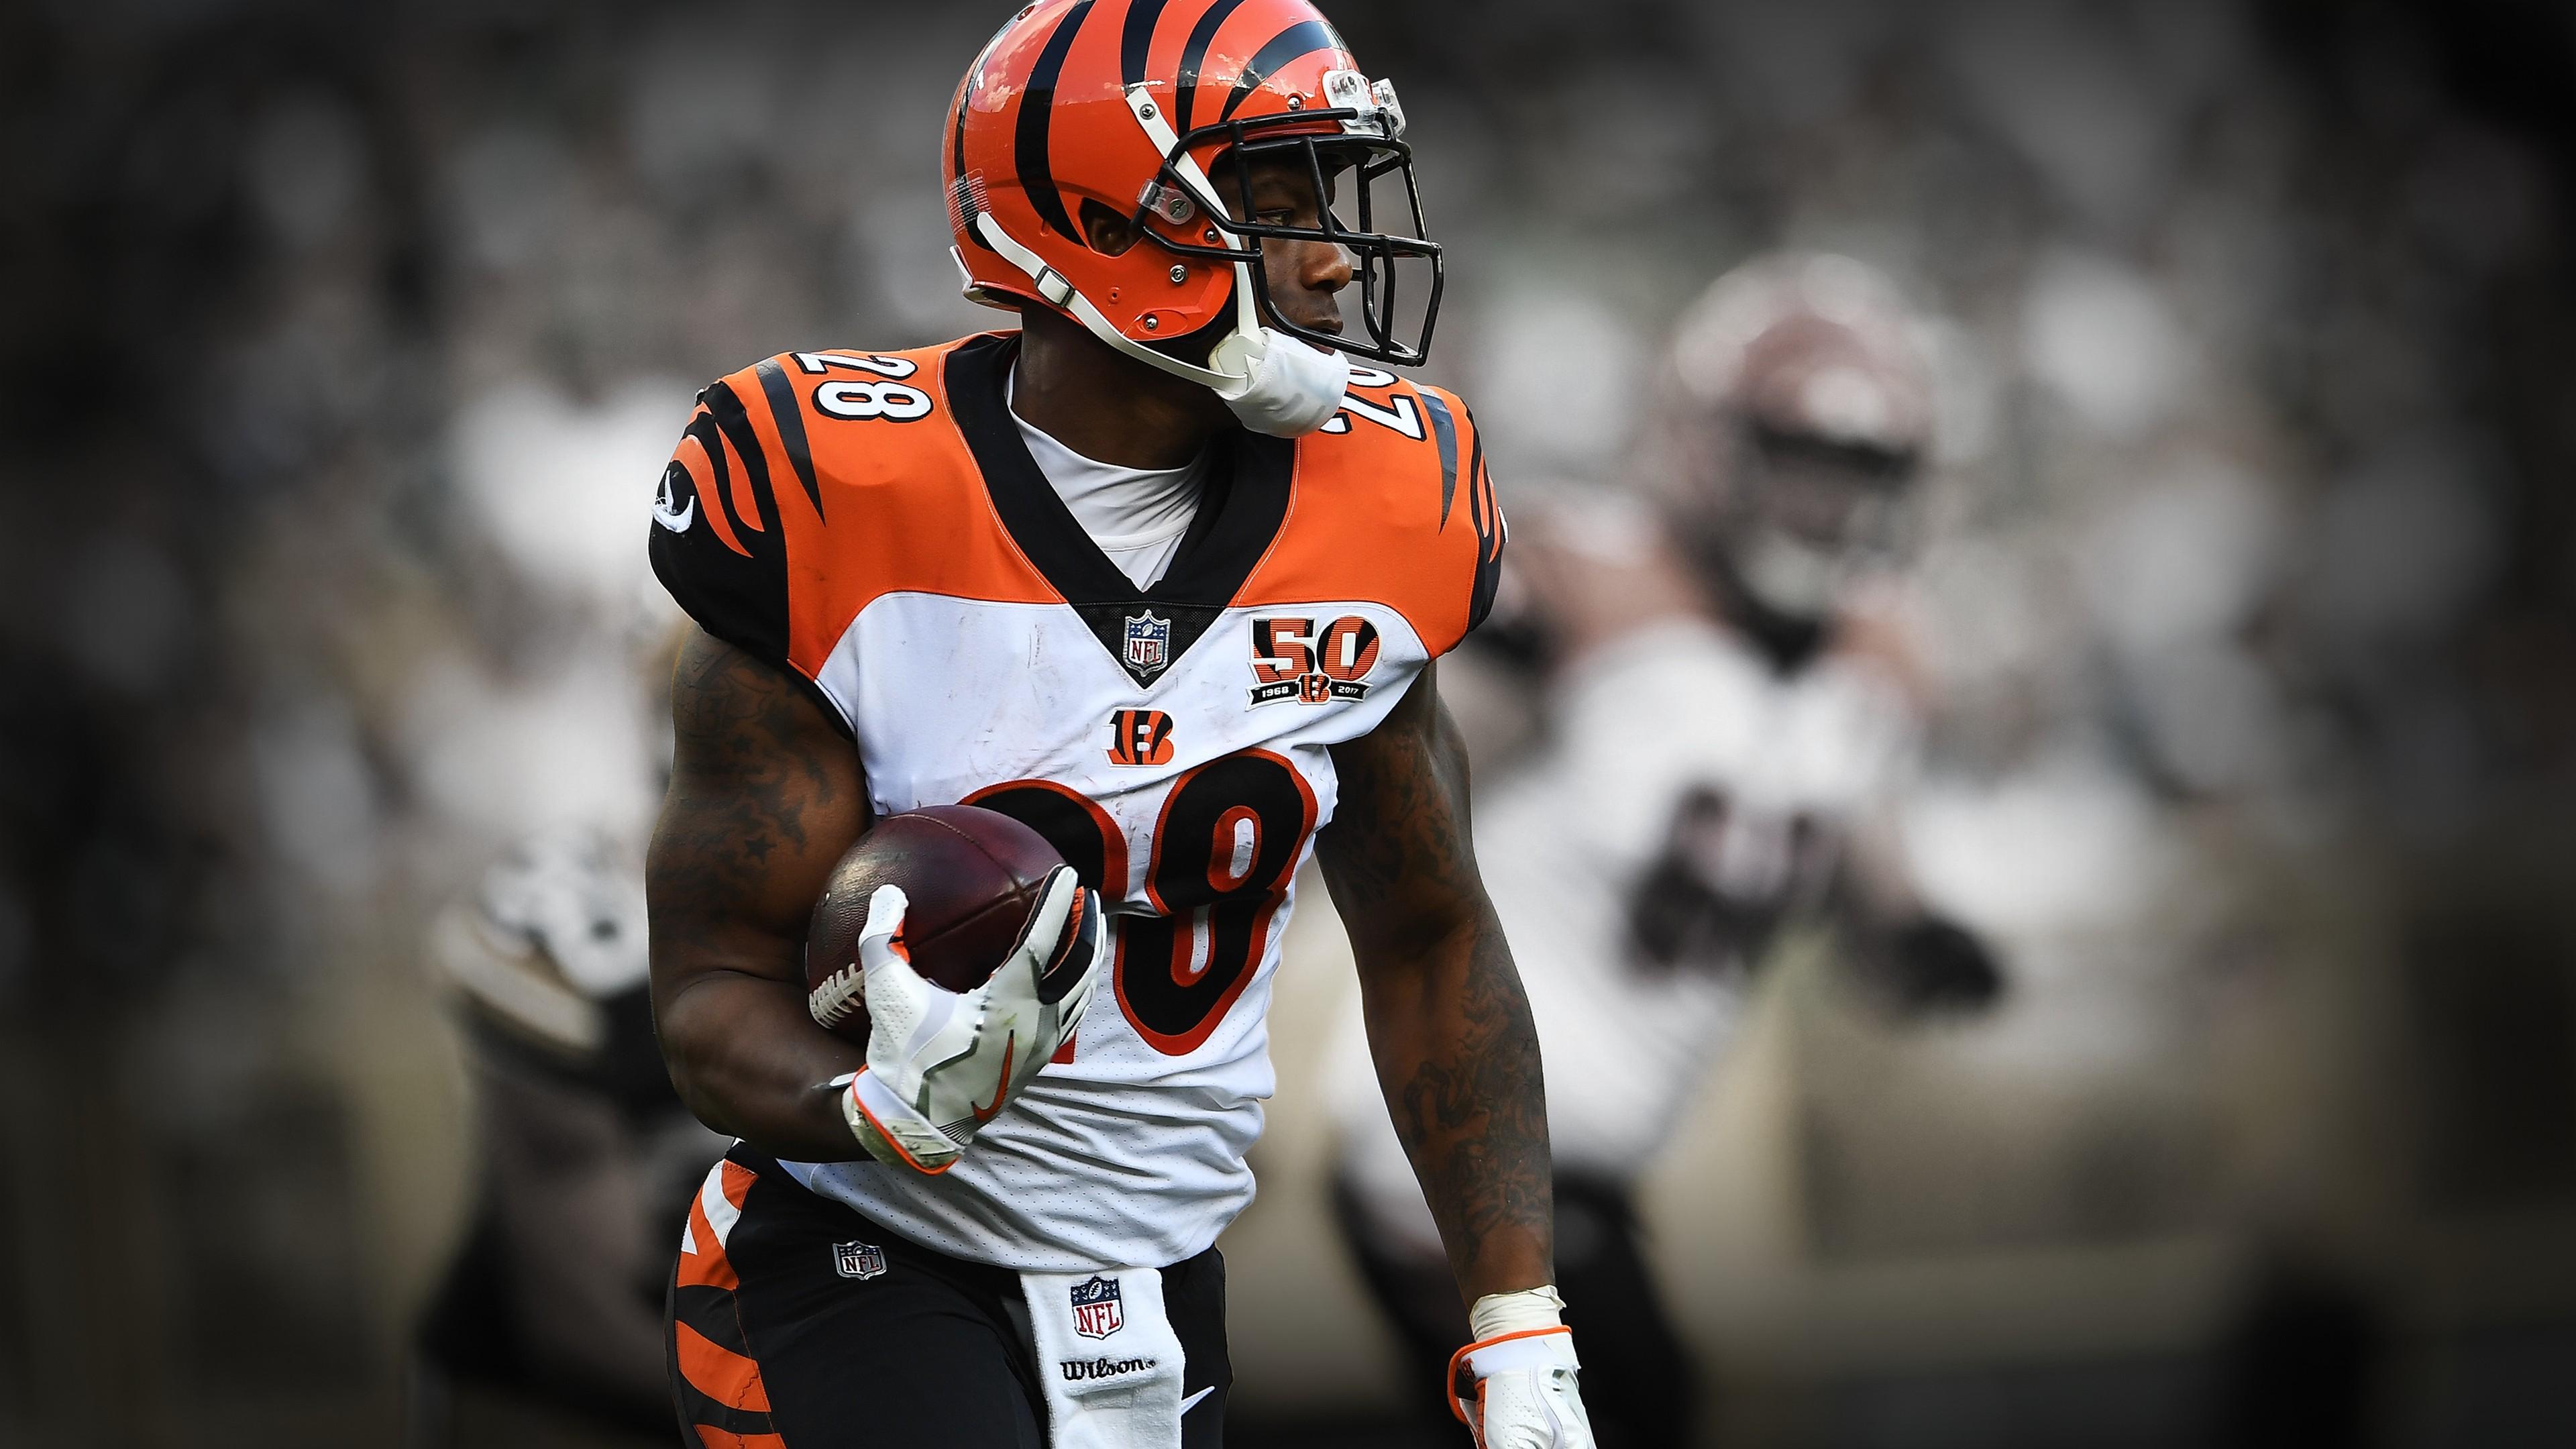 Joe Mixon Athletes Cincinnati OH Cincinnati Bengals Ohio 3840x2160